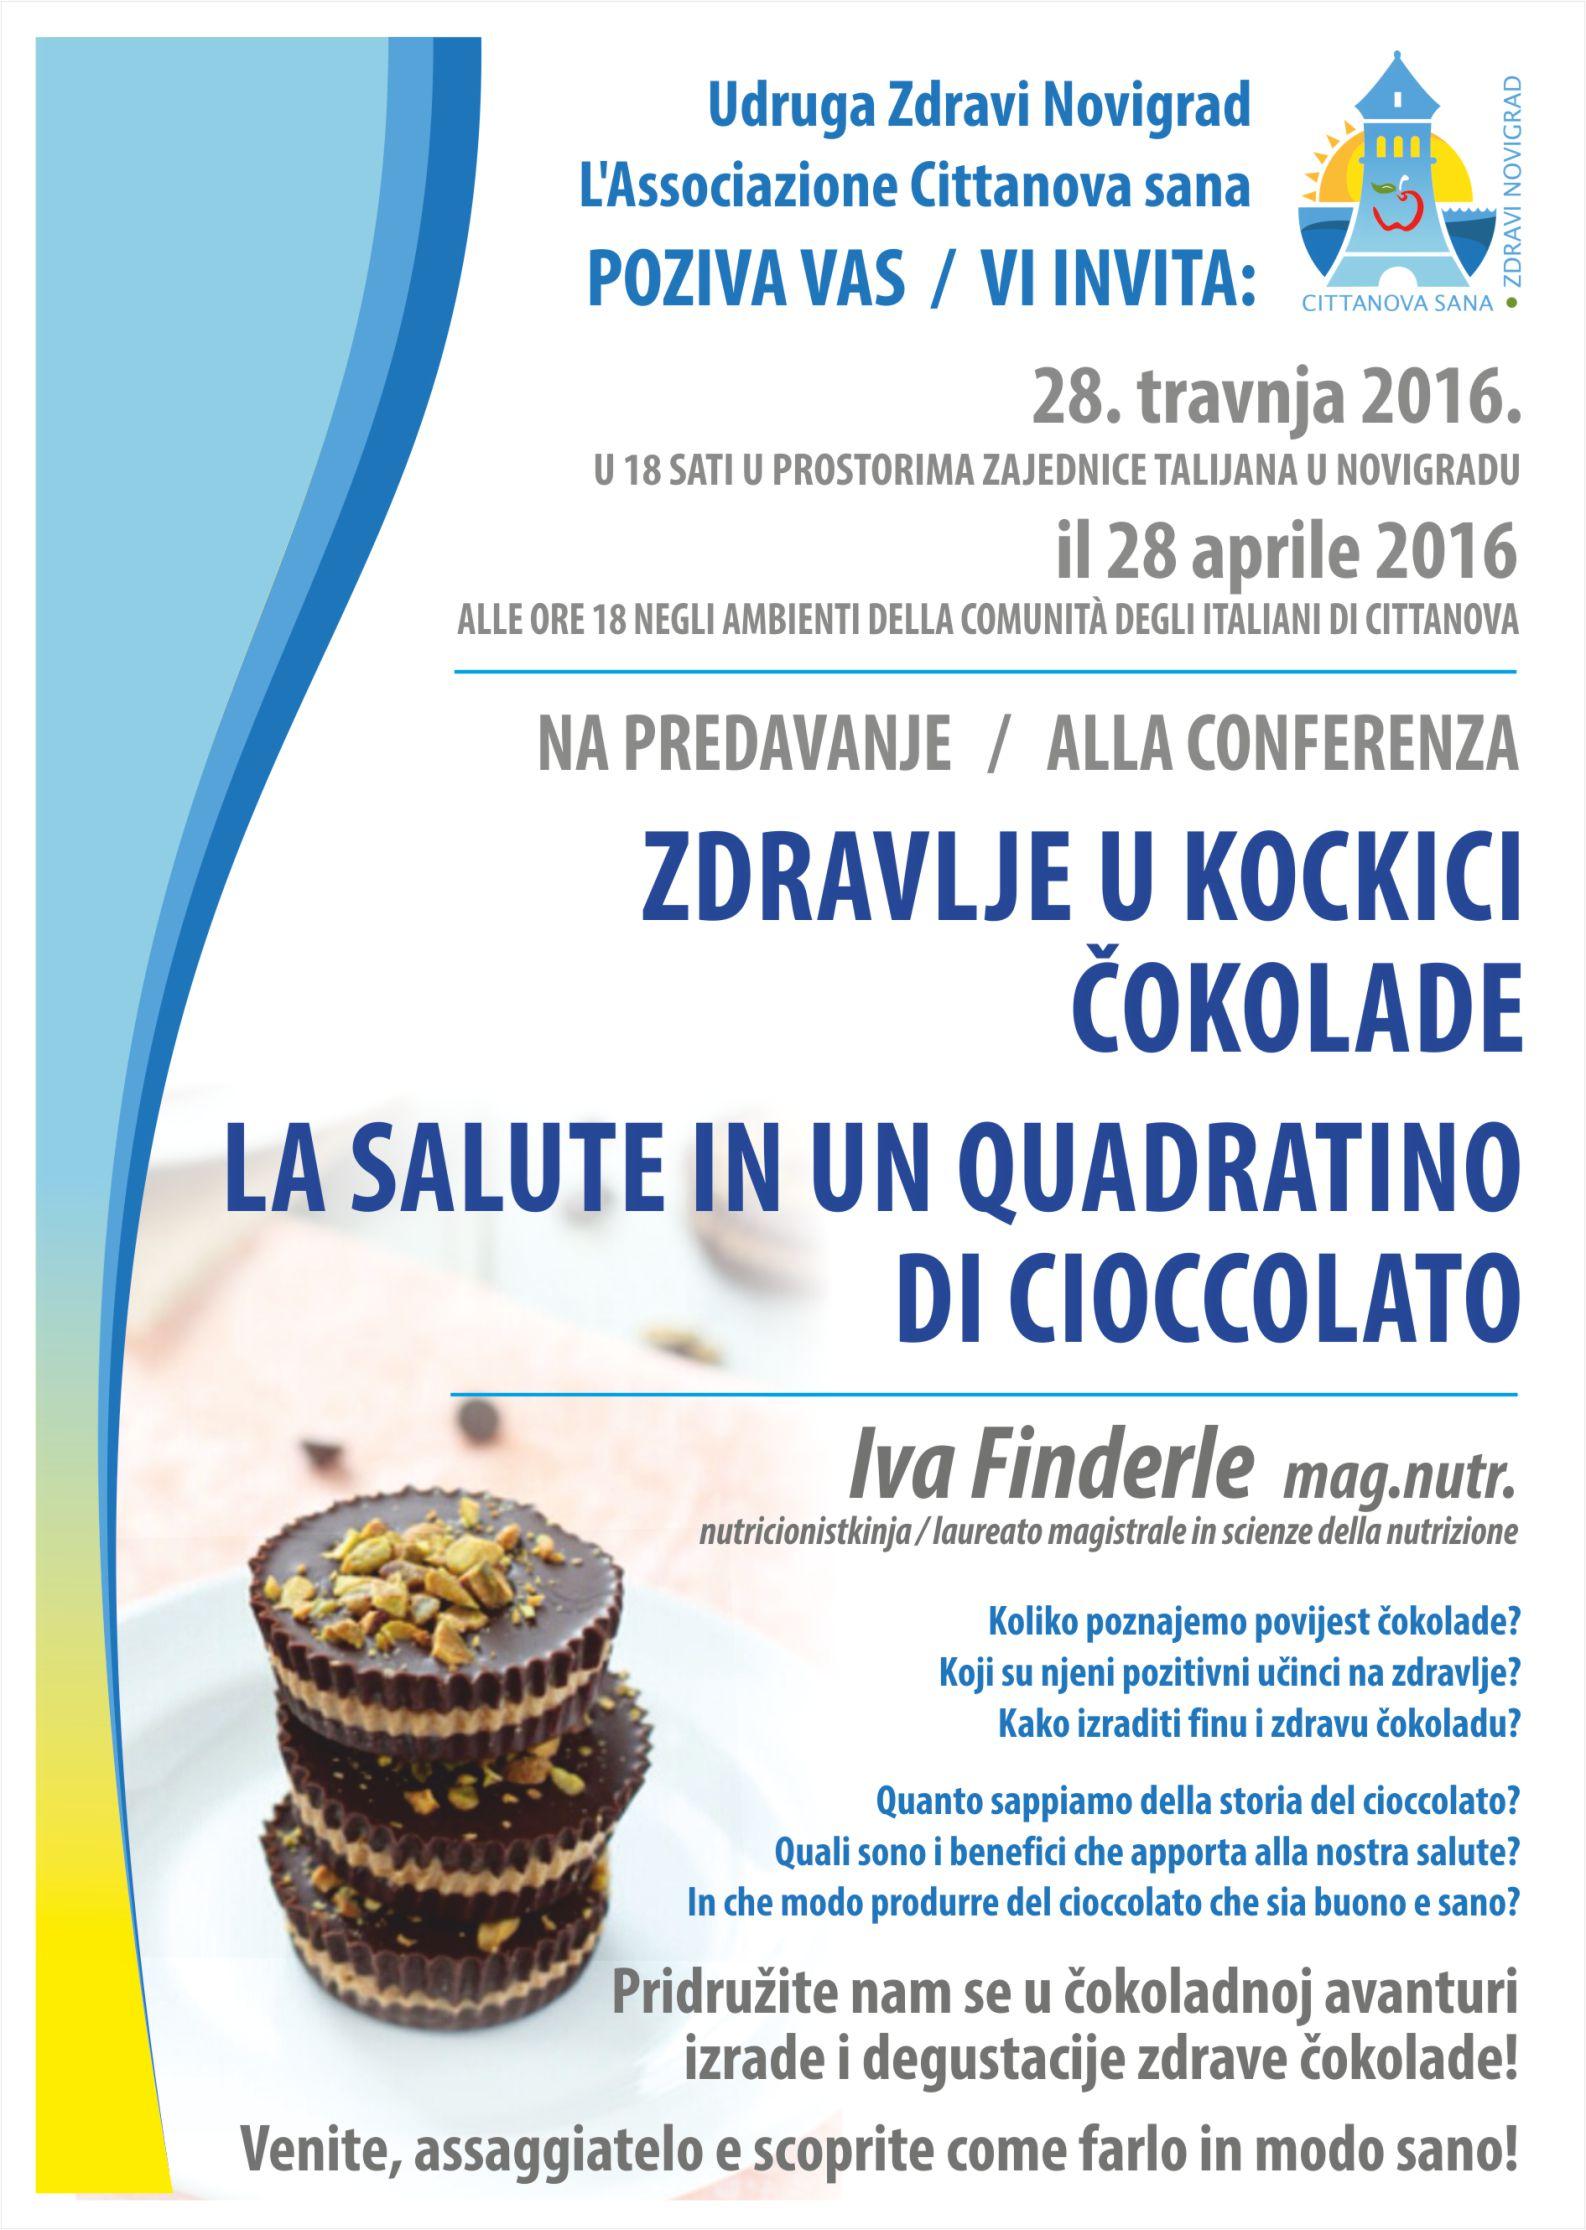 http://www.novigrad.hr/Predavanje_-_Iva_Finderle_mag._nutr_Zdravlje_u_kockici_okolade